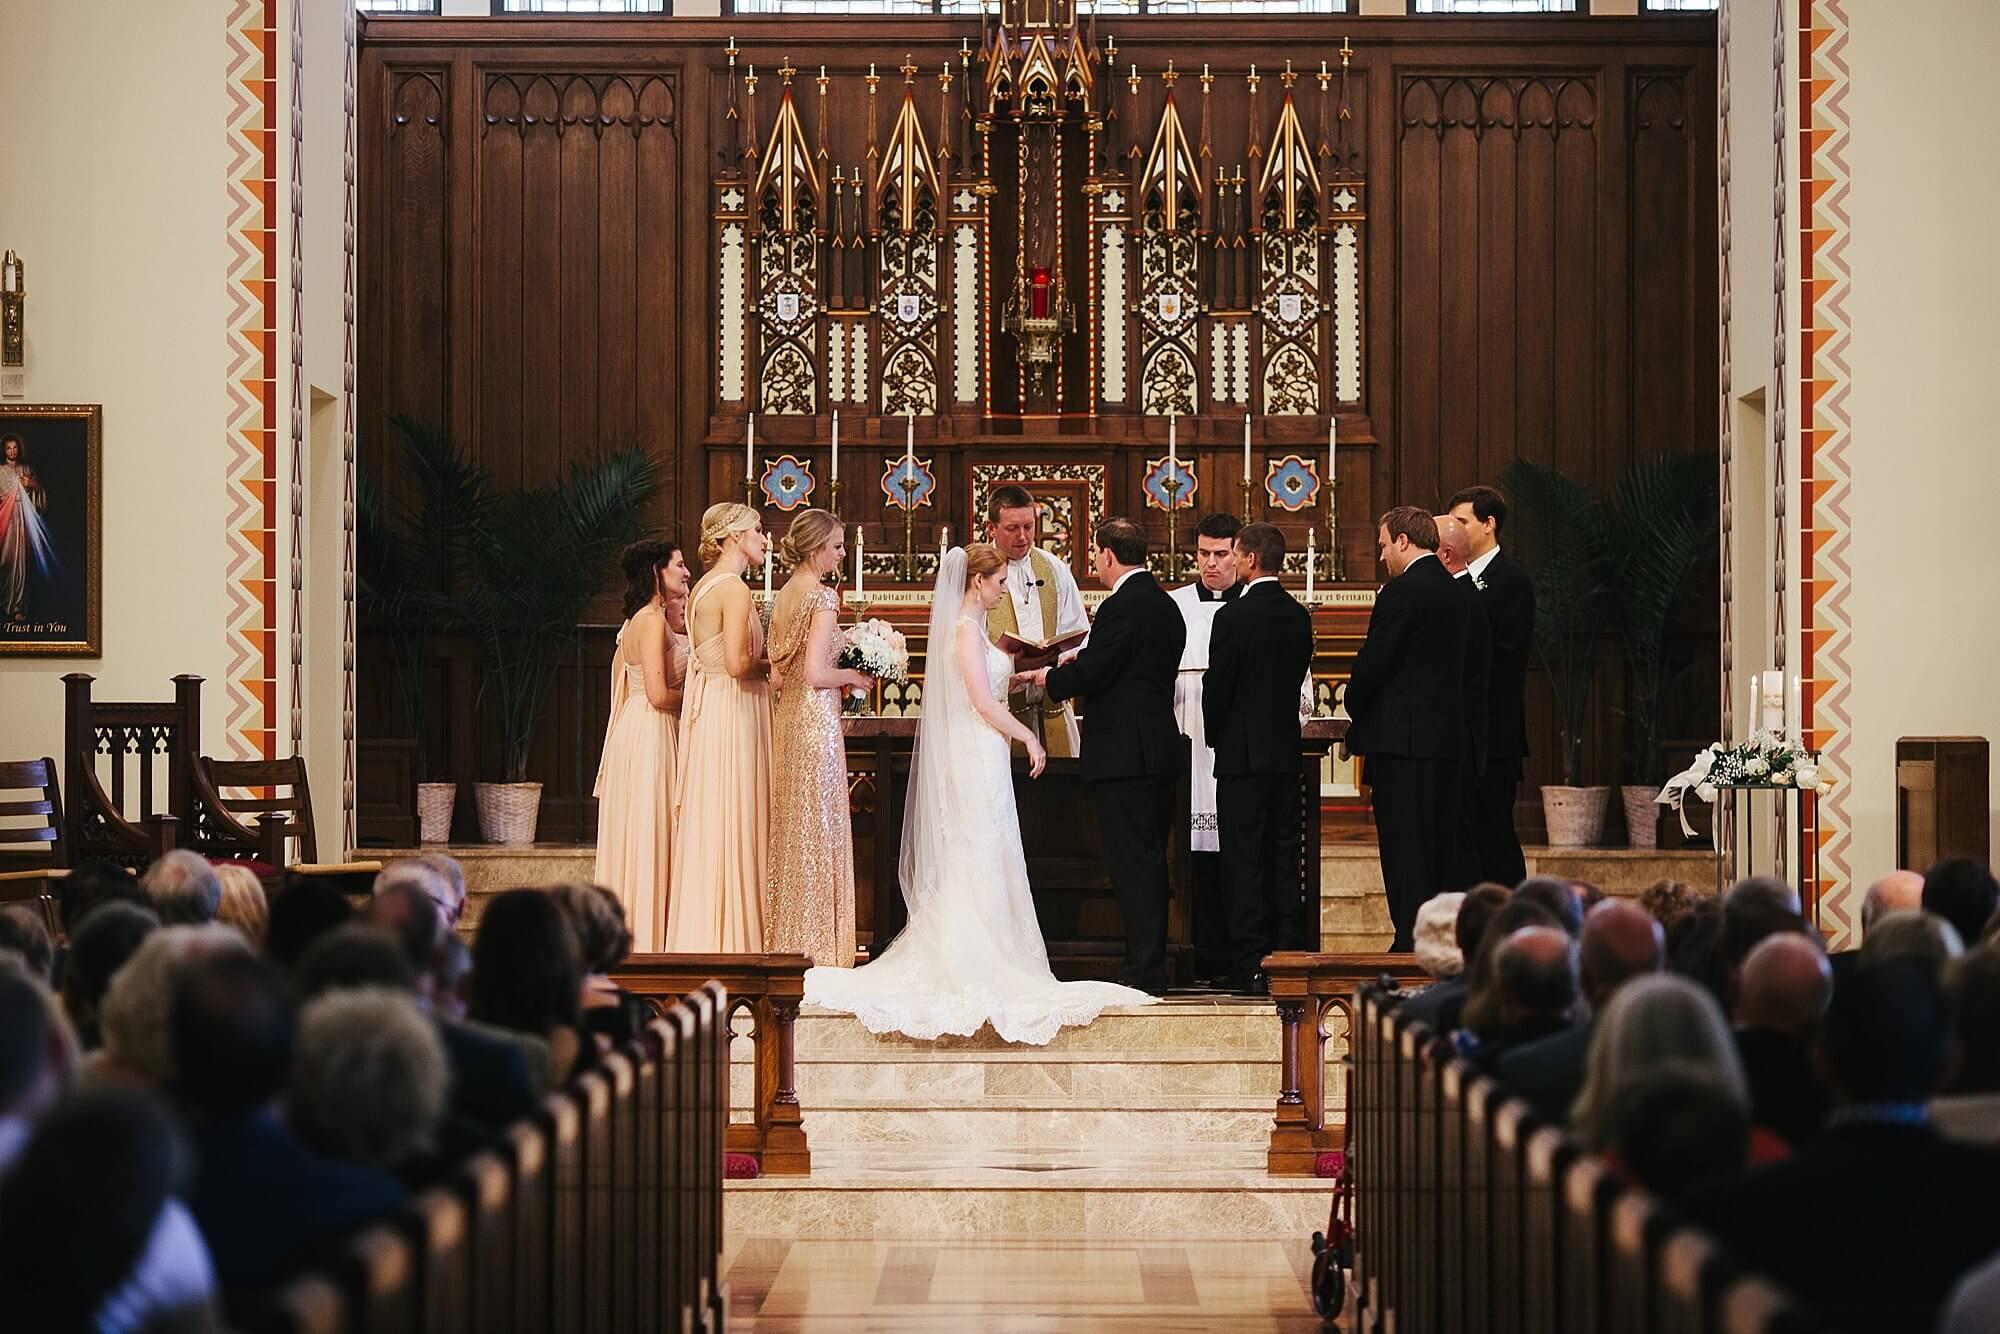 St. Thomas Aquinas Church, Lincoln, Nebraska  |  Dana Osborne Design Wedding Invitations